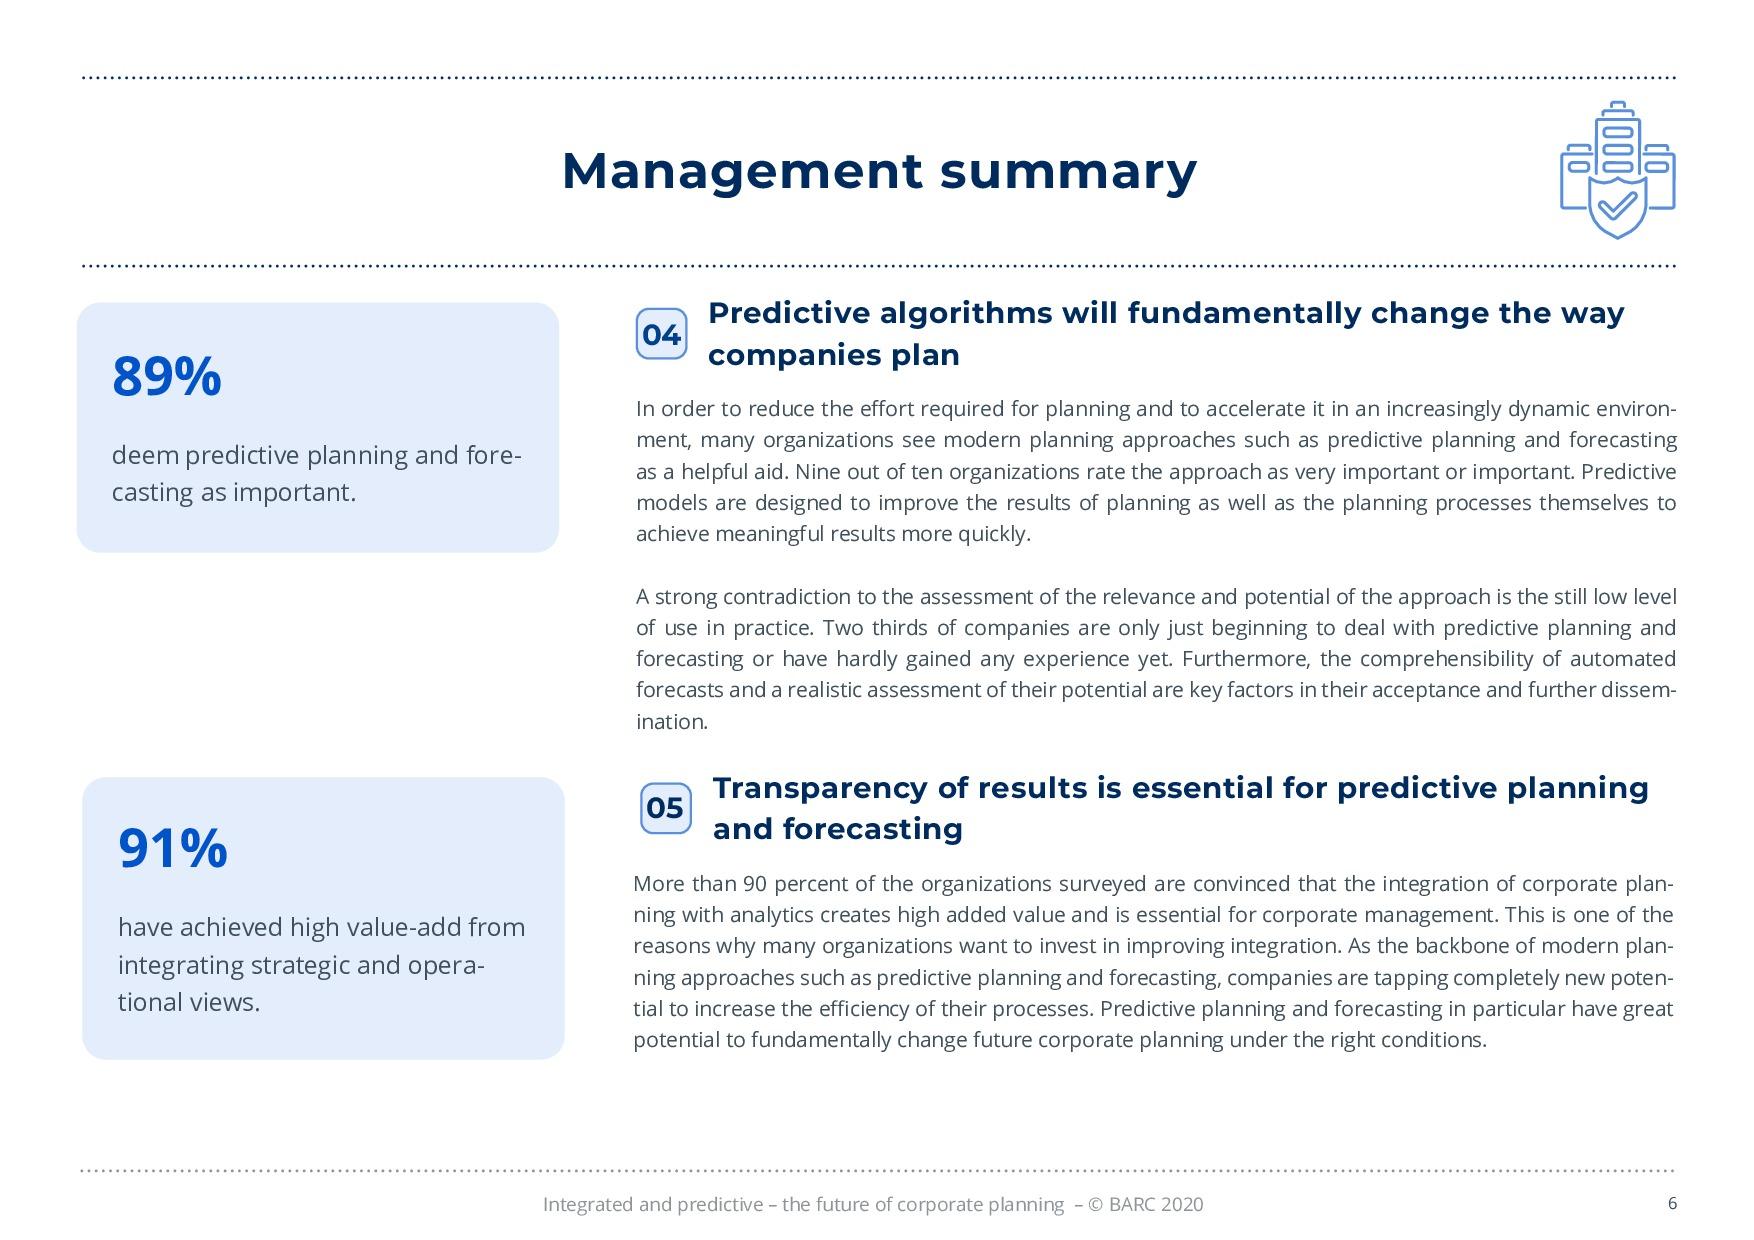 BARC – 統合と予測 – 経営計画の未来 | Page 6